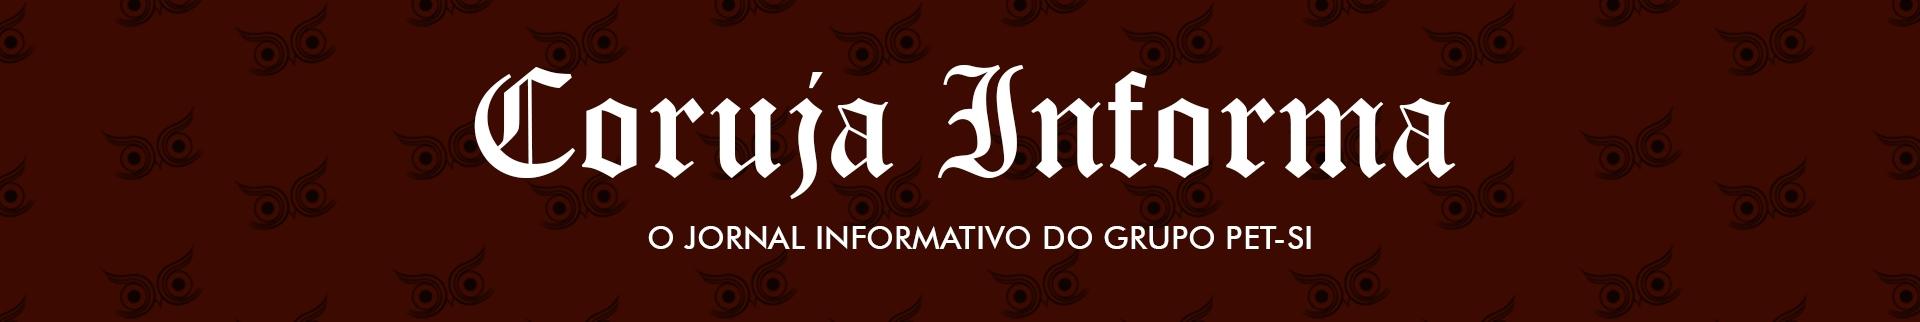 Coruja Informa